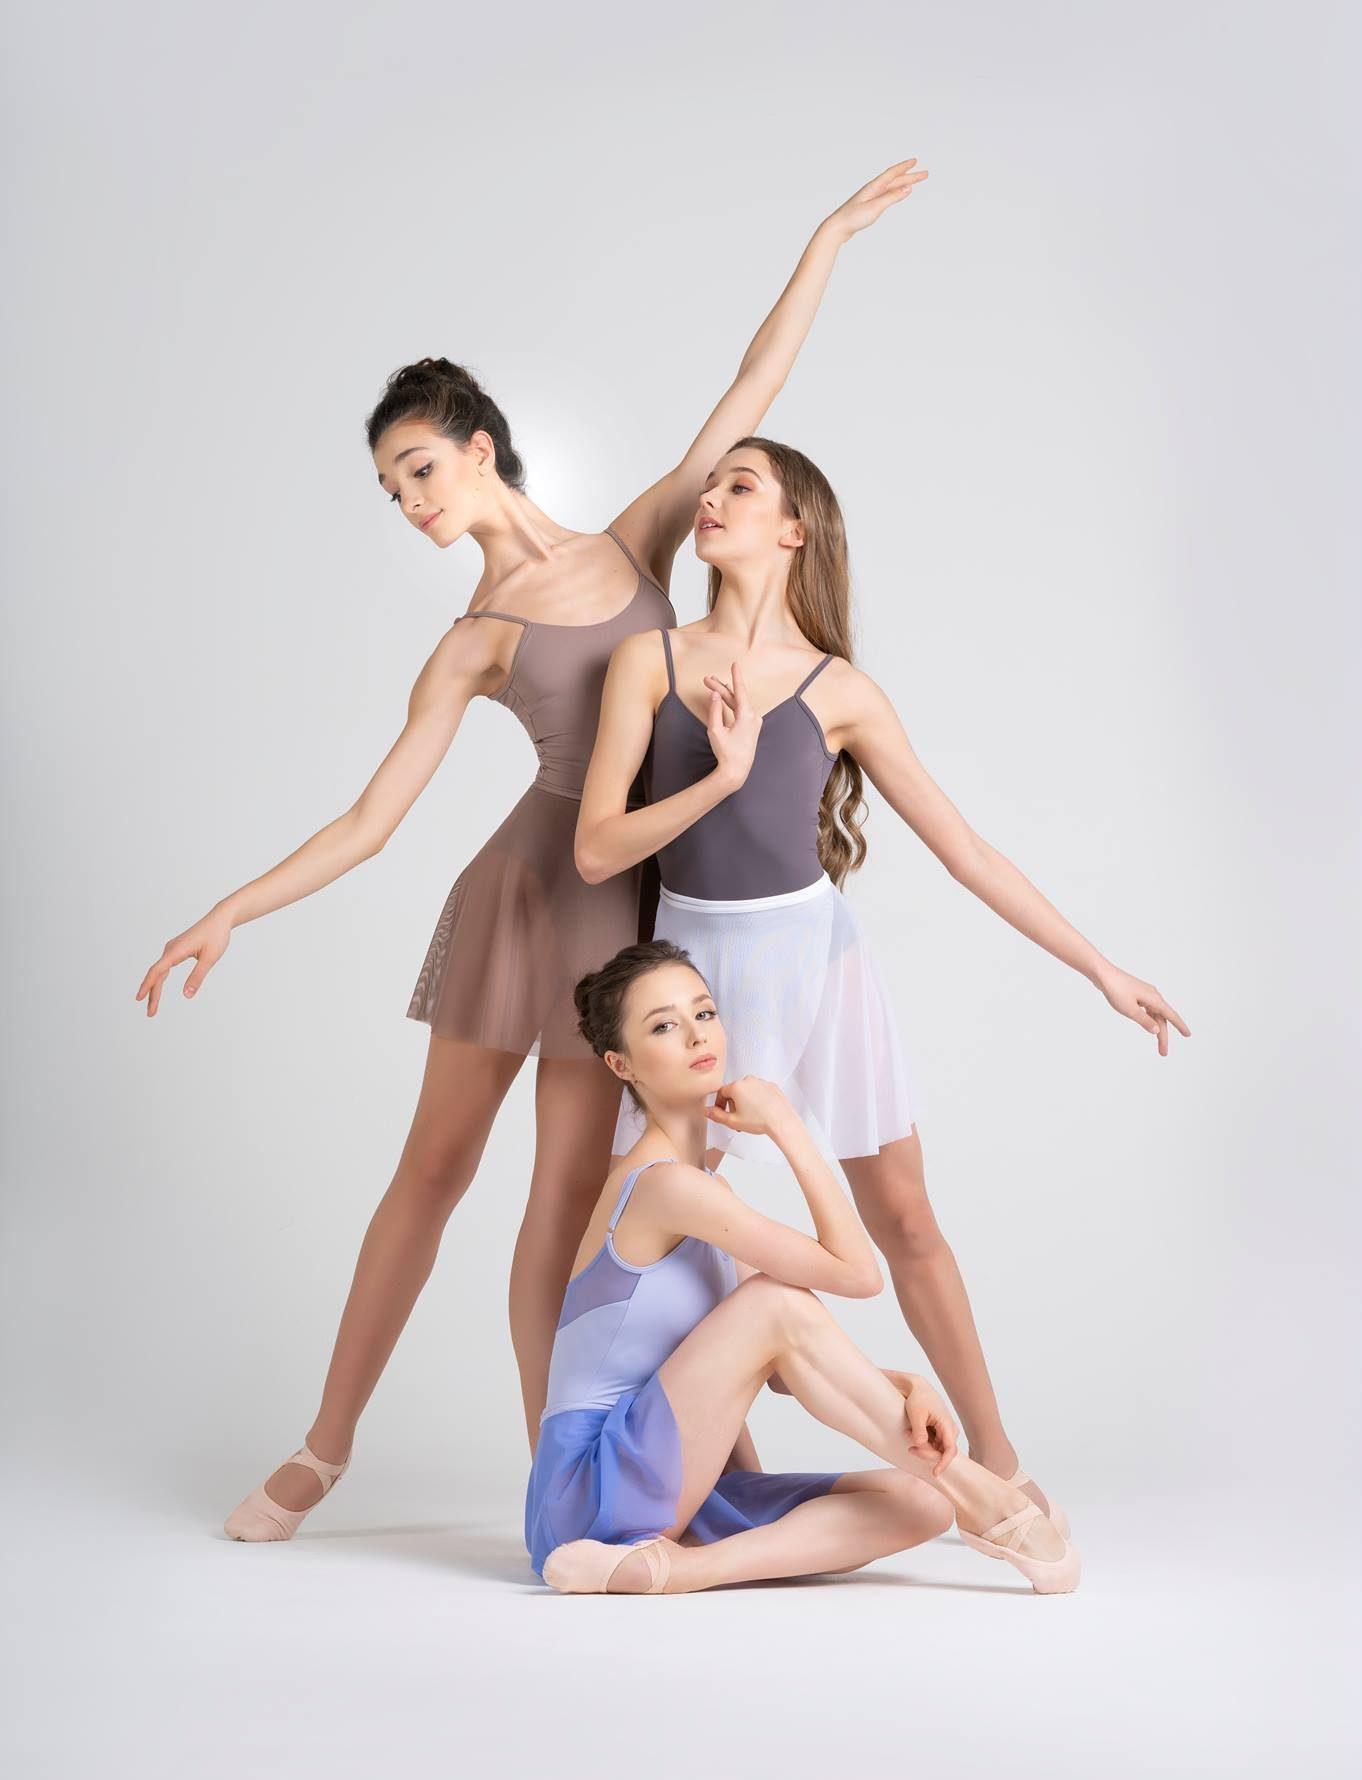 grishko academy balletpakjes bakc to school